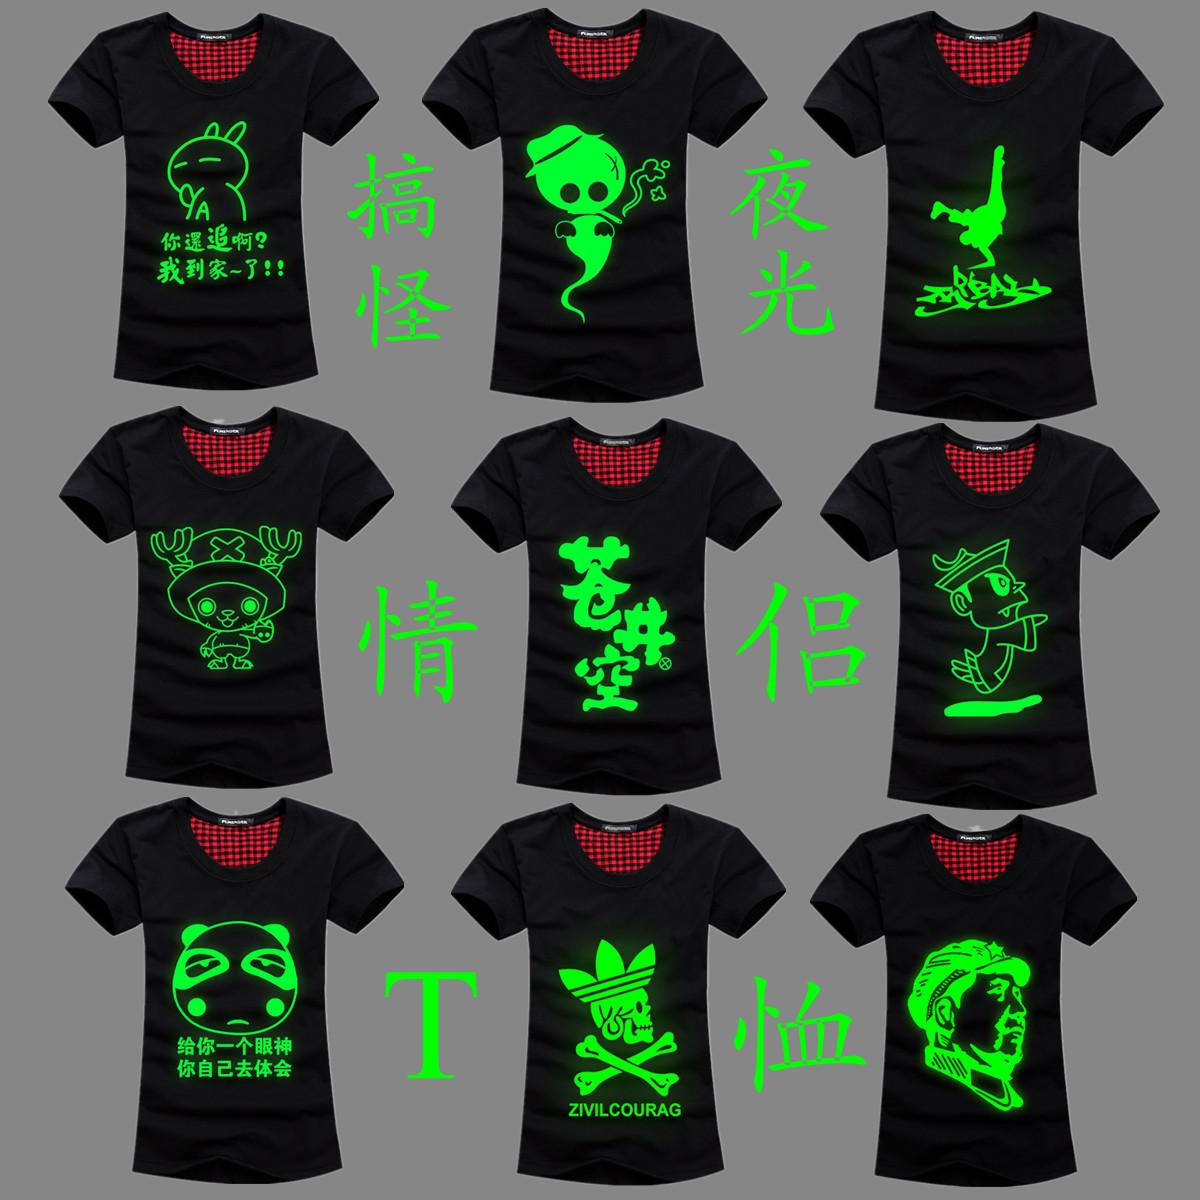 Lovers 2013 summer luminous short-sleeve T-shirt neon green basic shirt personality male light clothes